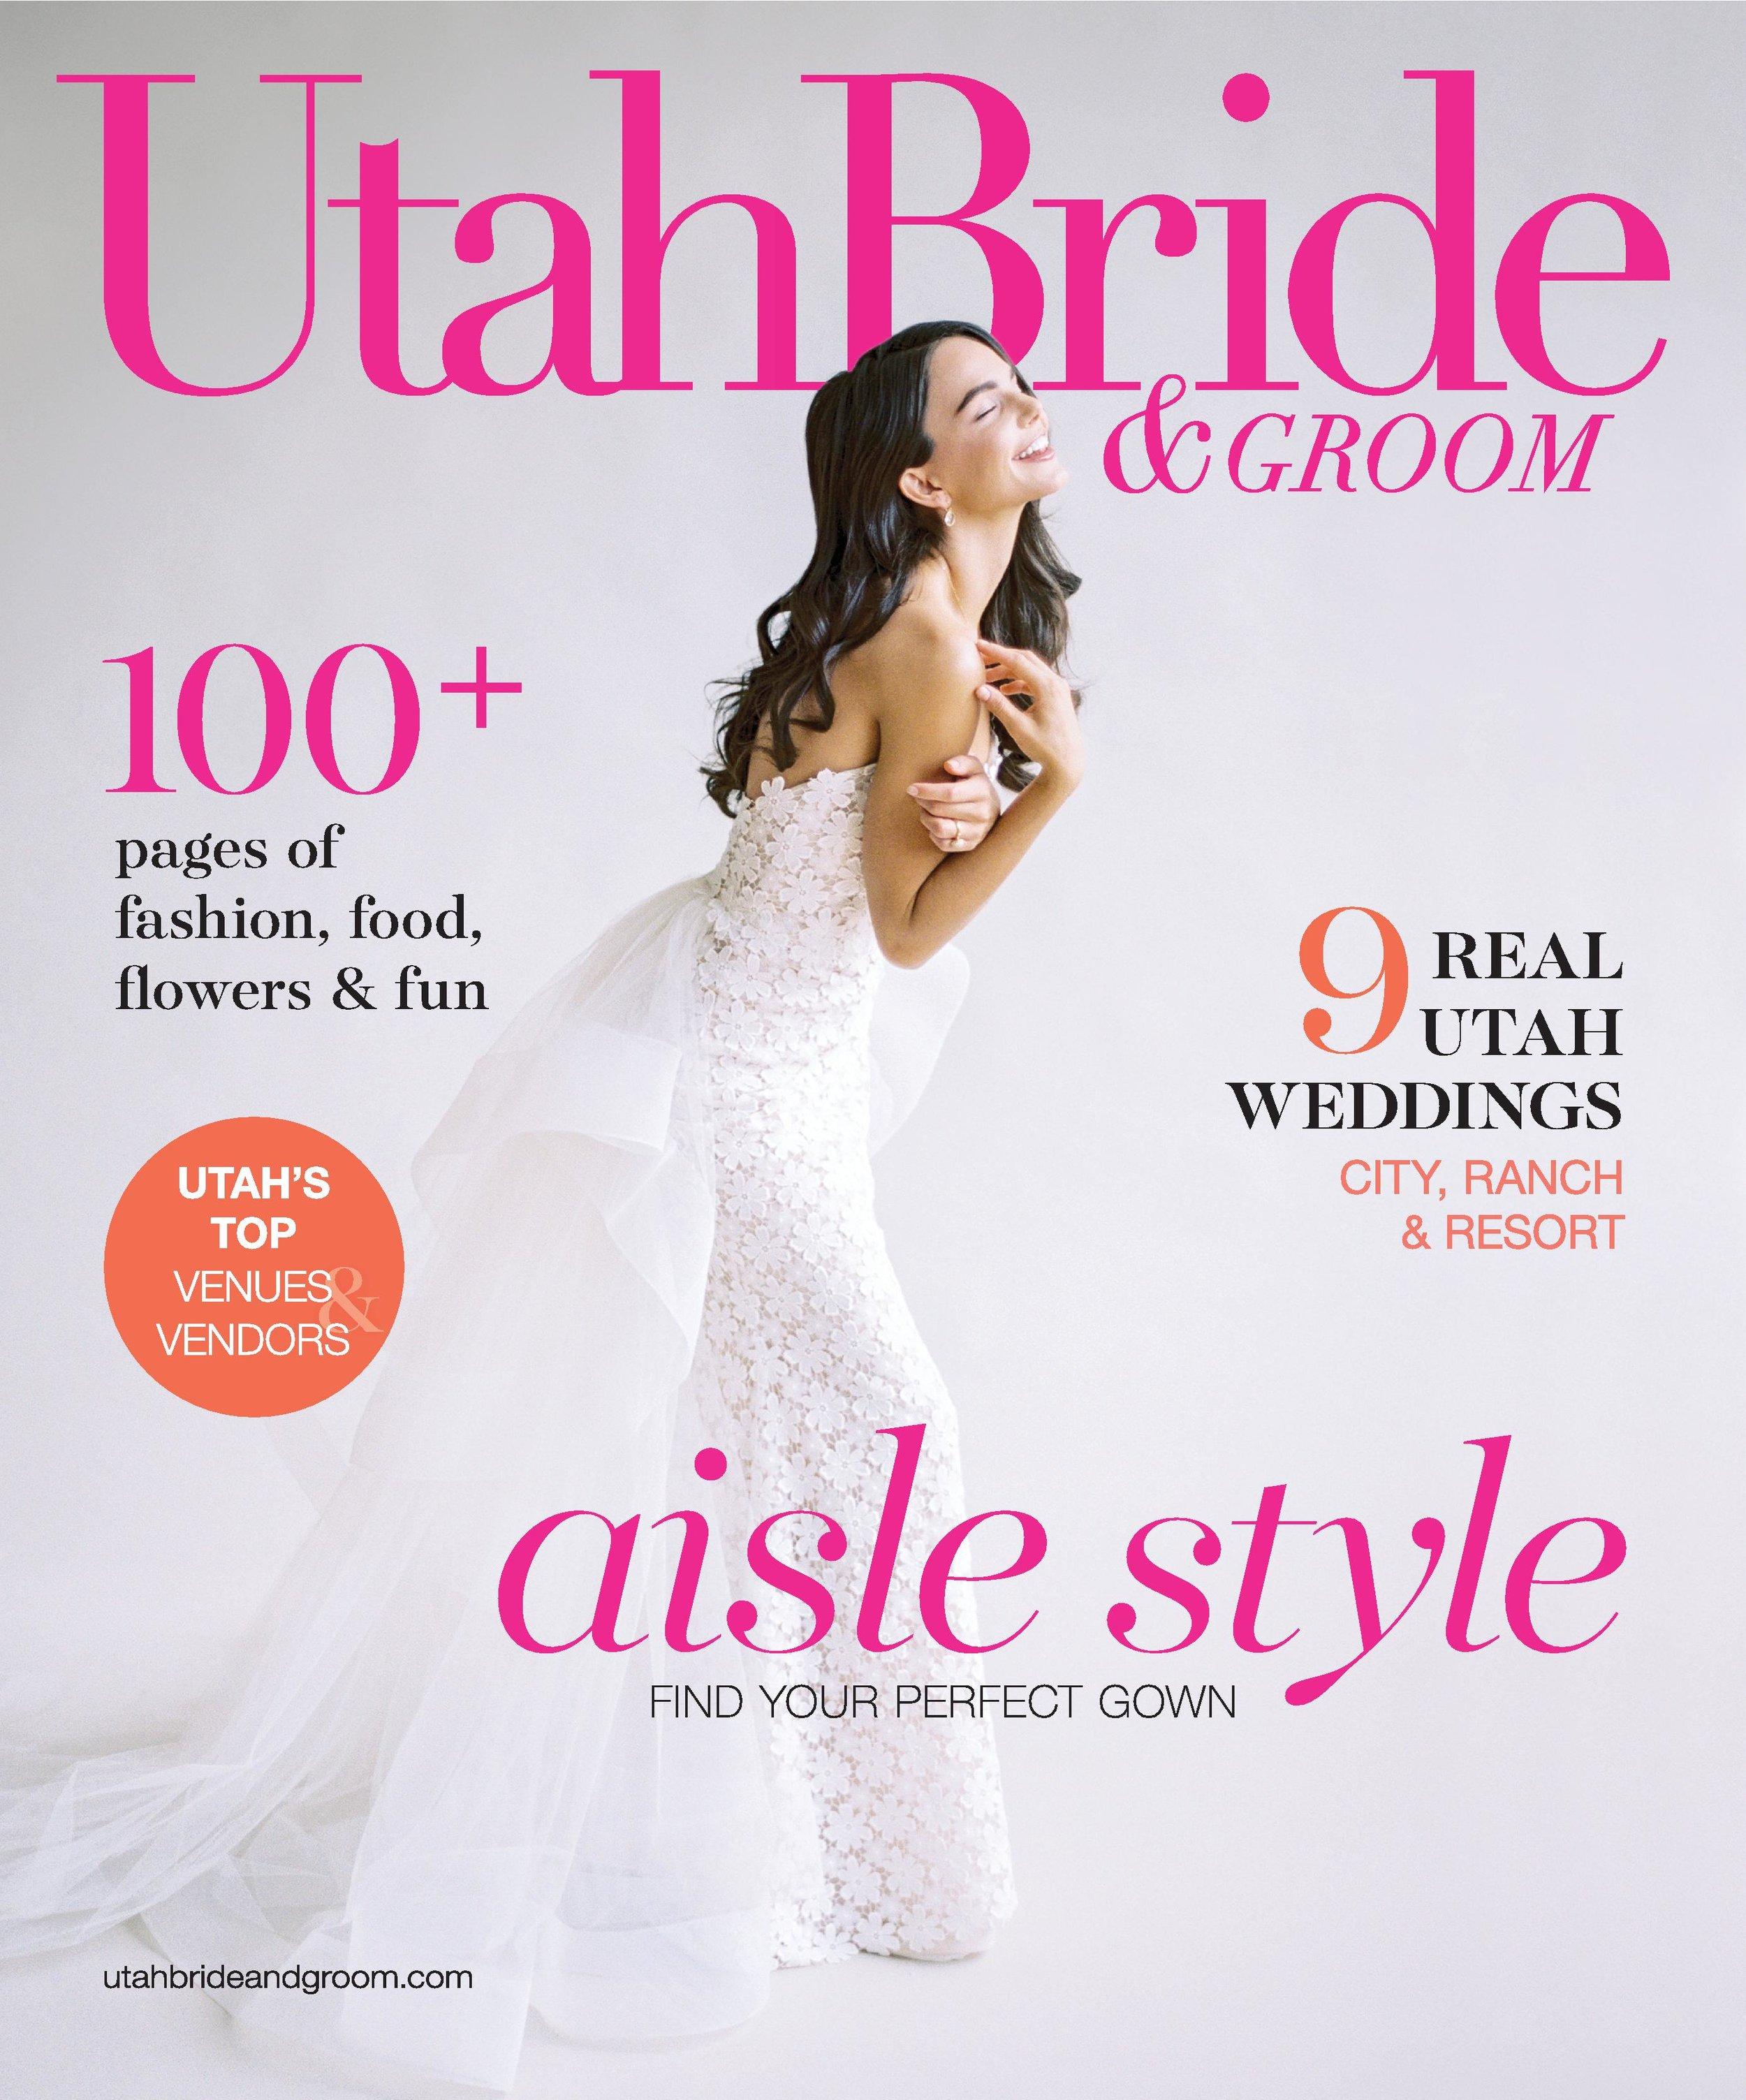 Utah Bride & Groom Magazine   UBG White Party   Eccles Theater   Emerald Green and Gold   Utah Wedding Professionals   Michelle Leo Events   Utah Event Planner and Designer